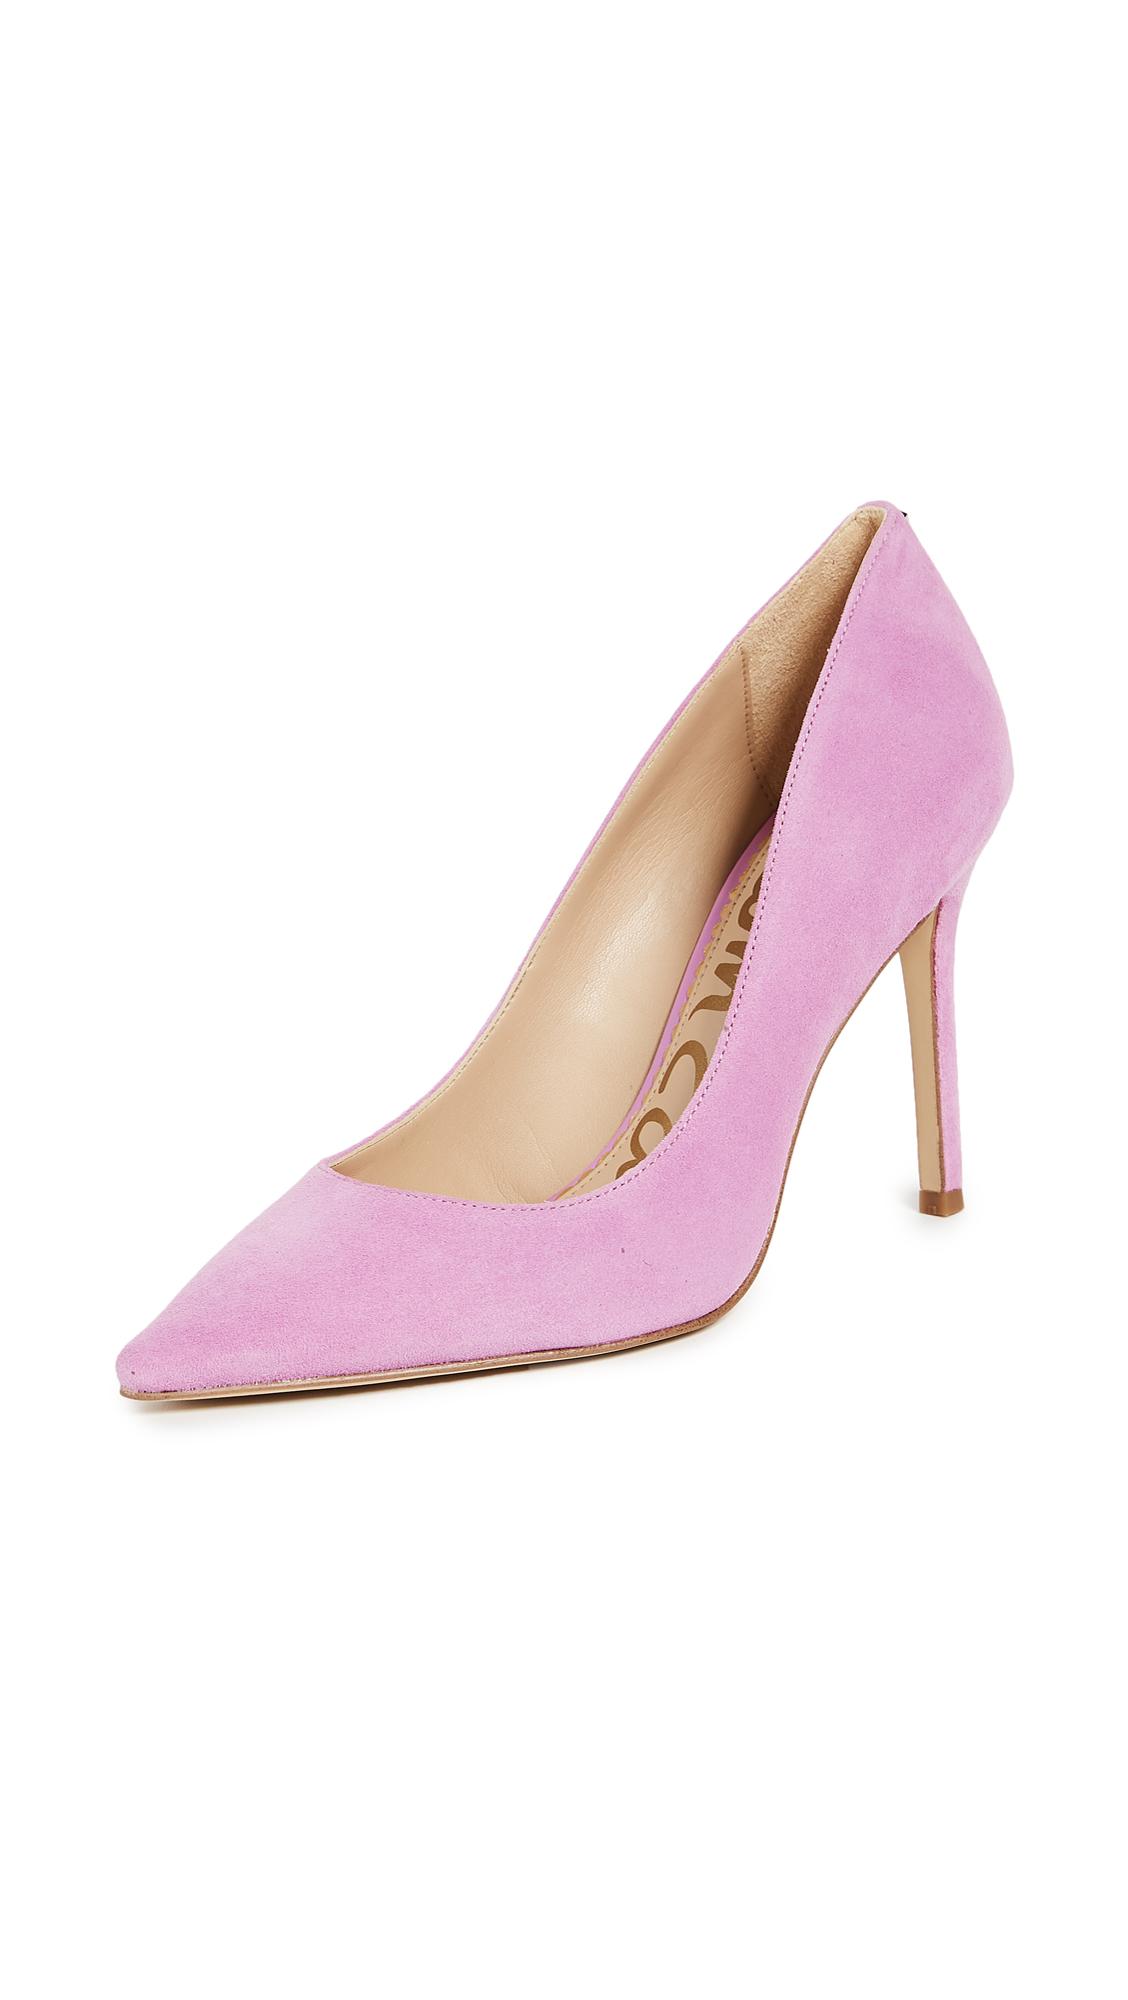 Sam Edelman Hazel Pumps - Fiji Pink